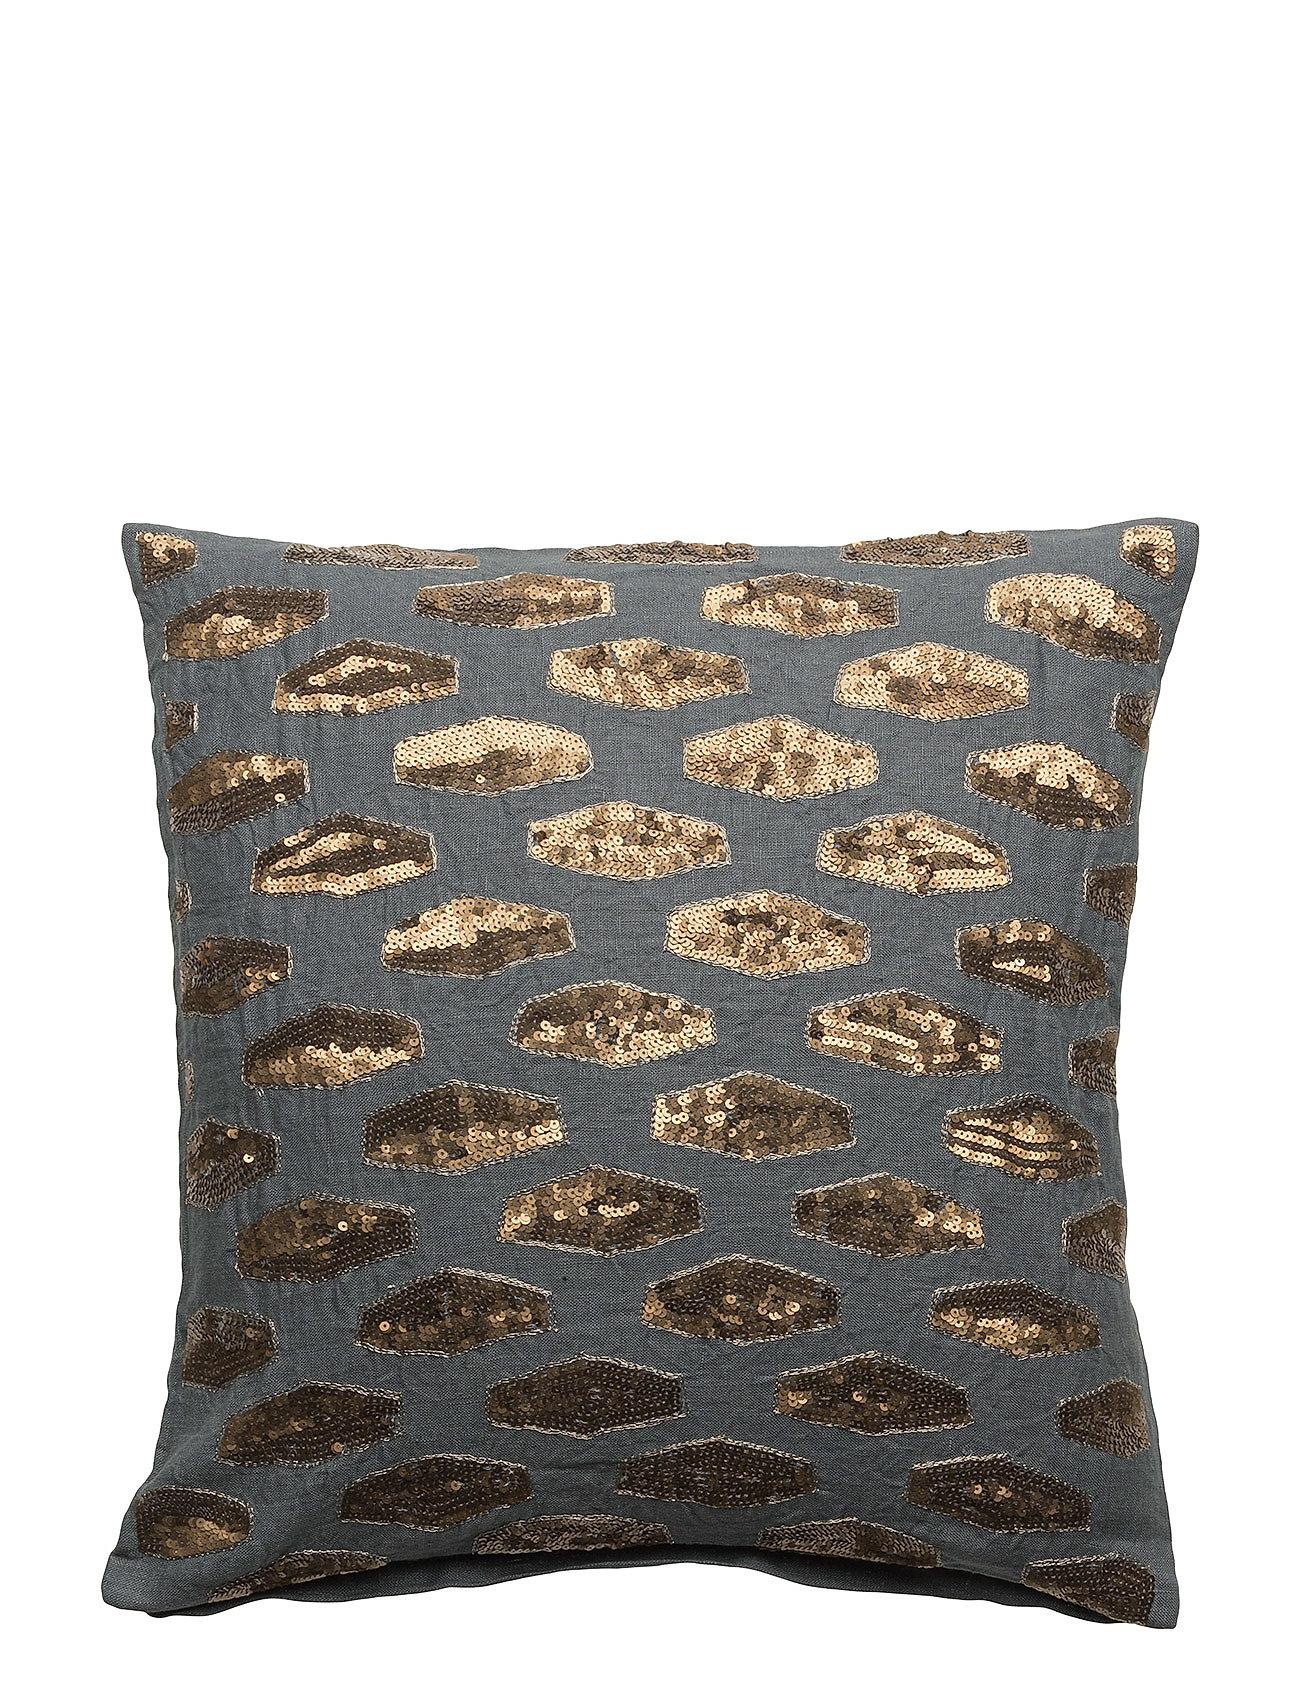 DAY Home Fifties Cushion Cover - AGATH GREEN